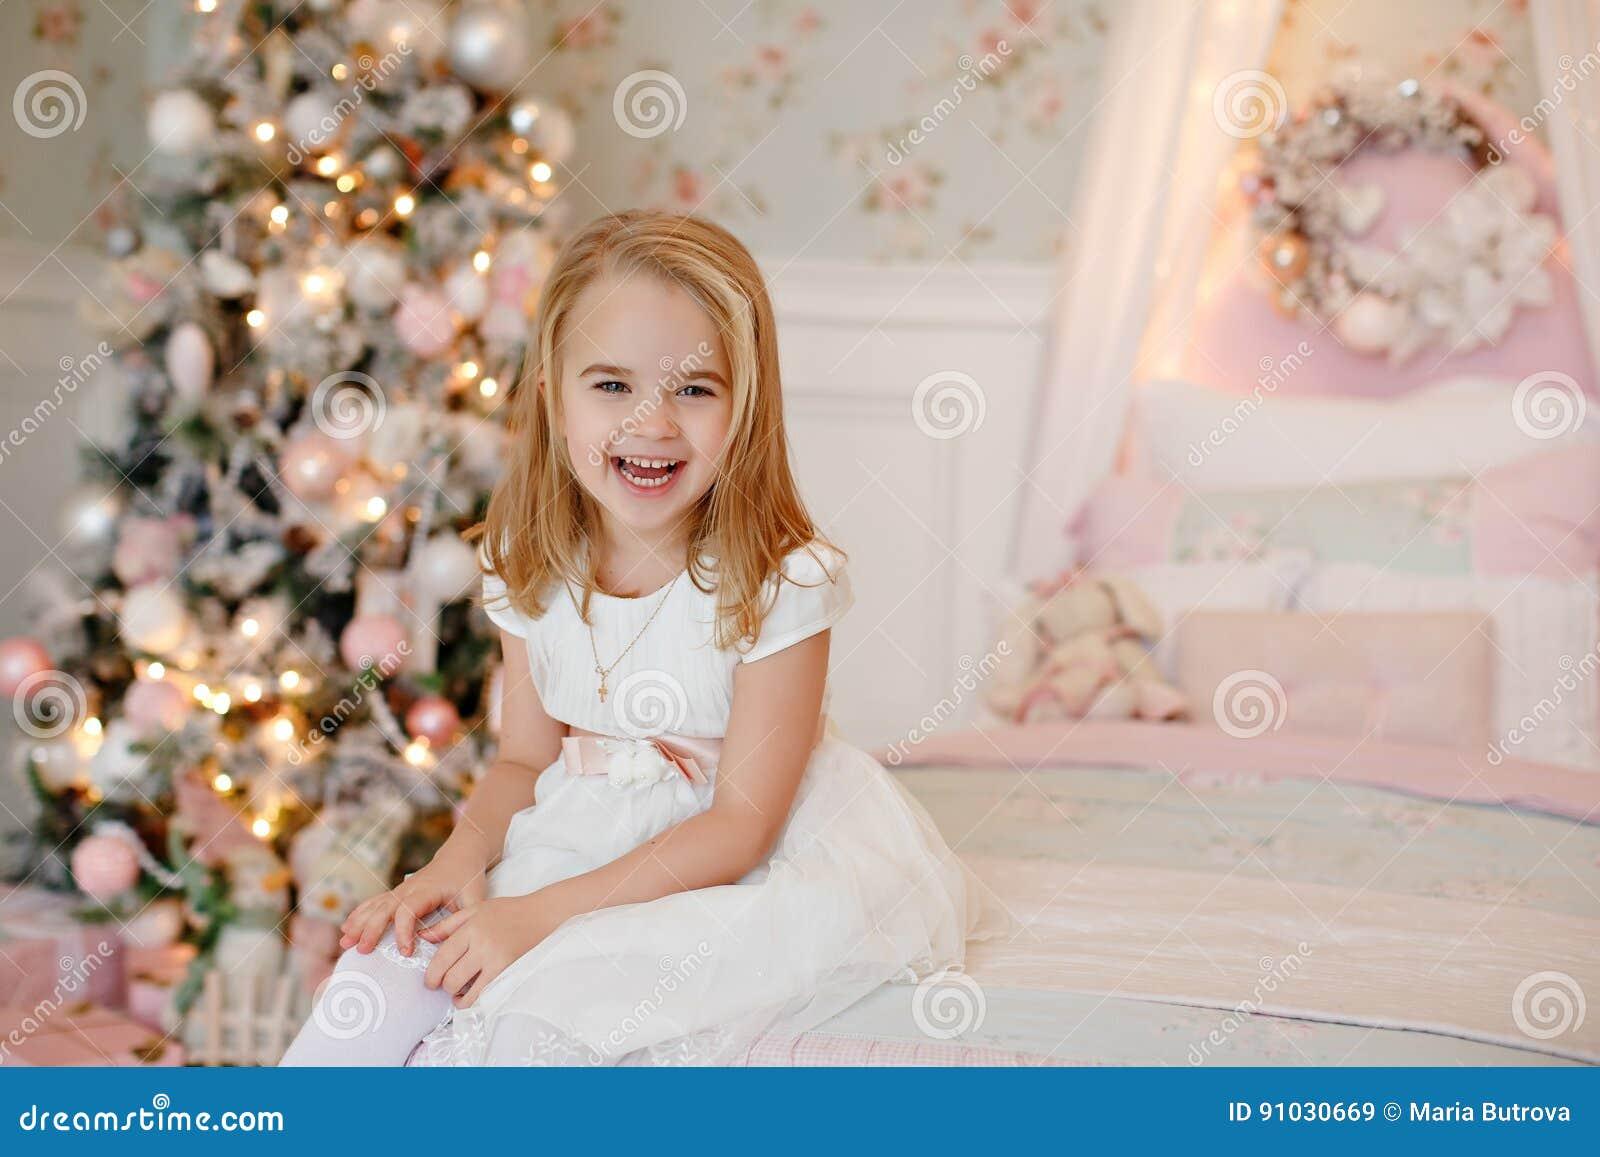 Vestido blanco muy bonito